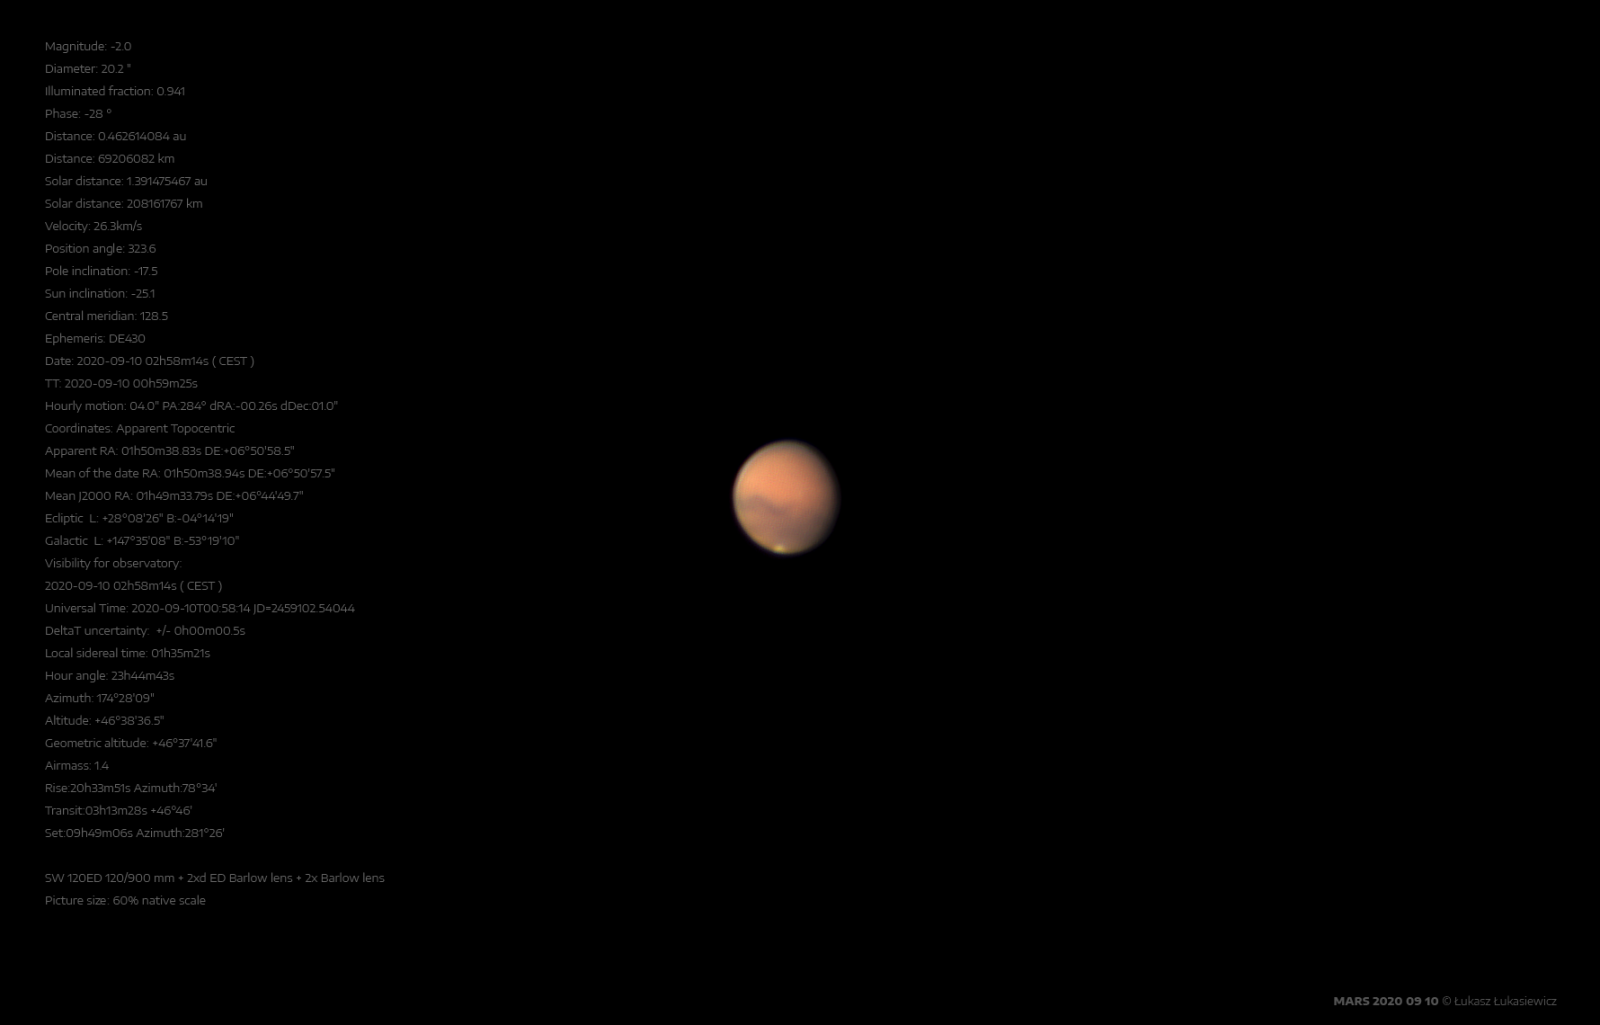 MARS-2020-09-10d.thumb.png.19abef2a78d6150d5e82c07f21ba9fd5.png